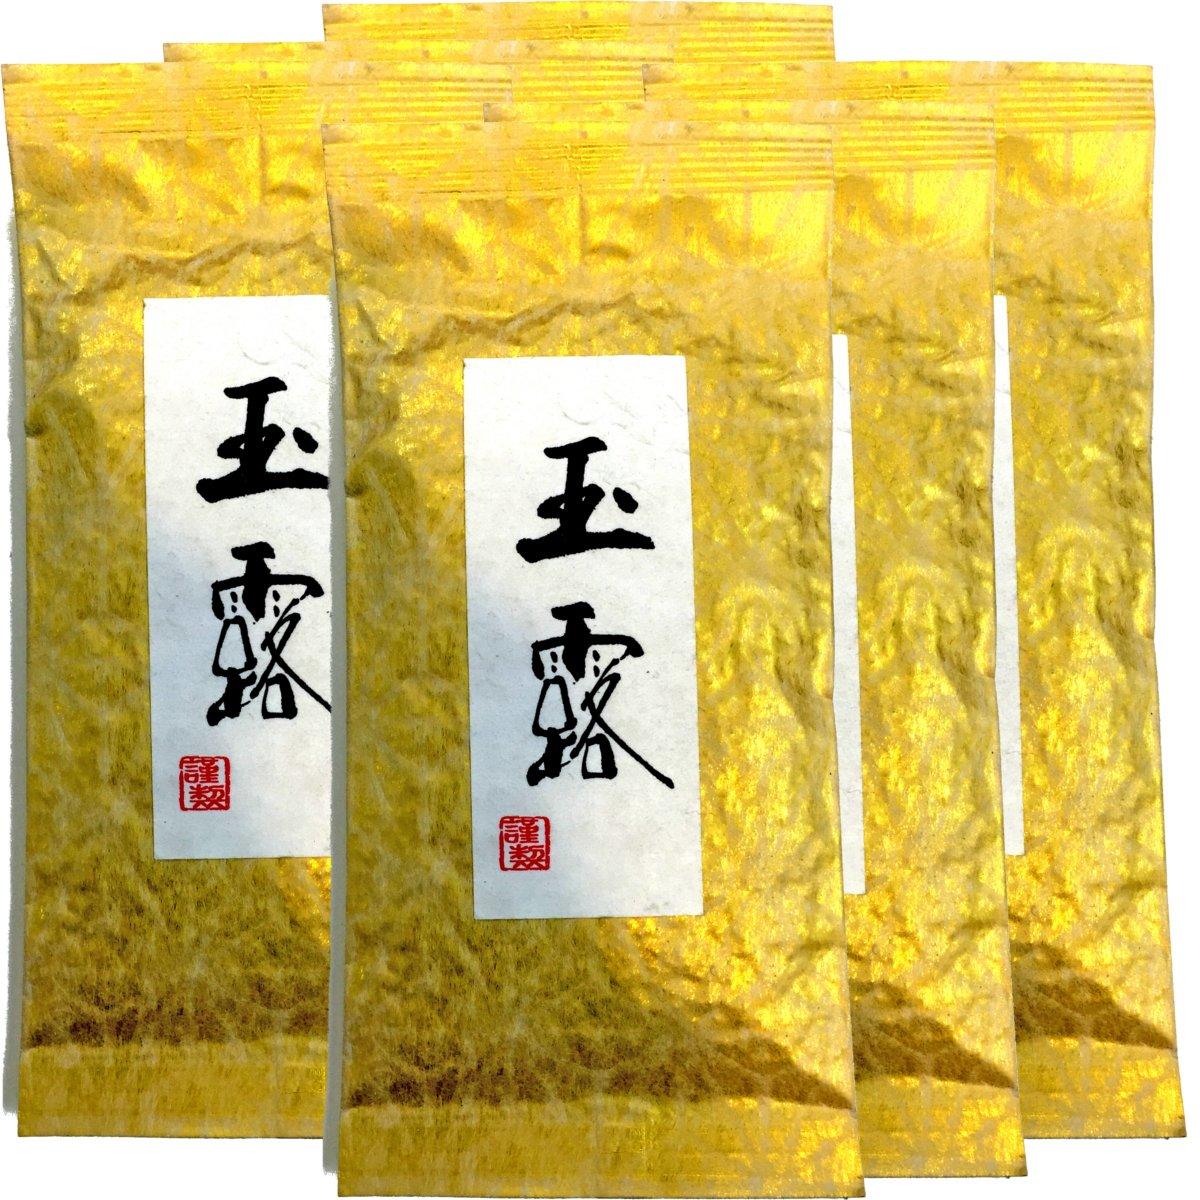 Japanese Tea Shop Yamaneen Gyokuro tea Green tea of the highest quality tea Uji-shi, Kyoto 100g. x 6packs